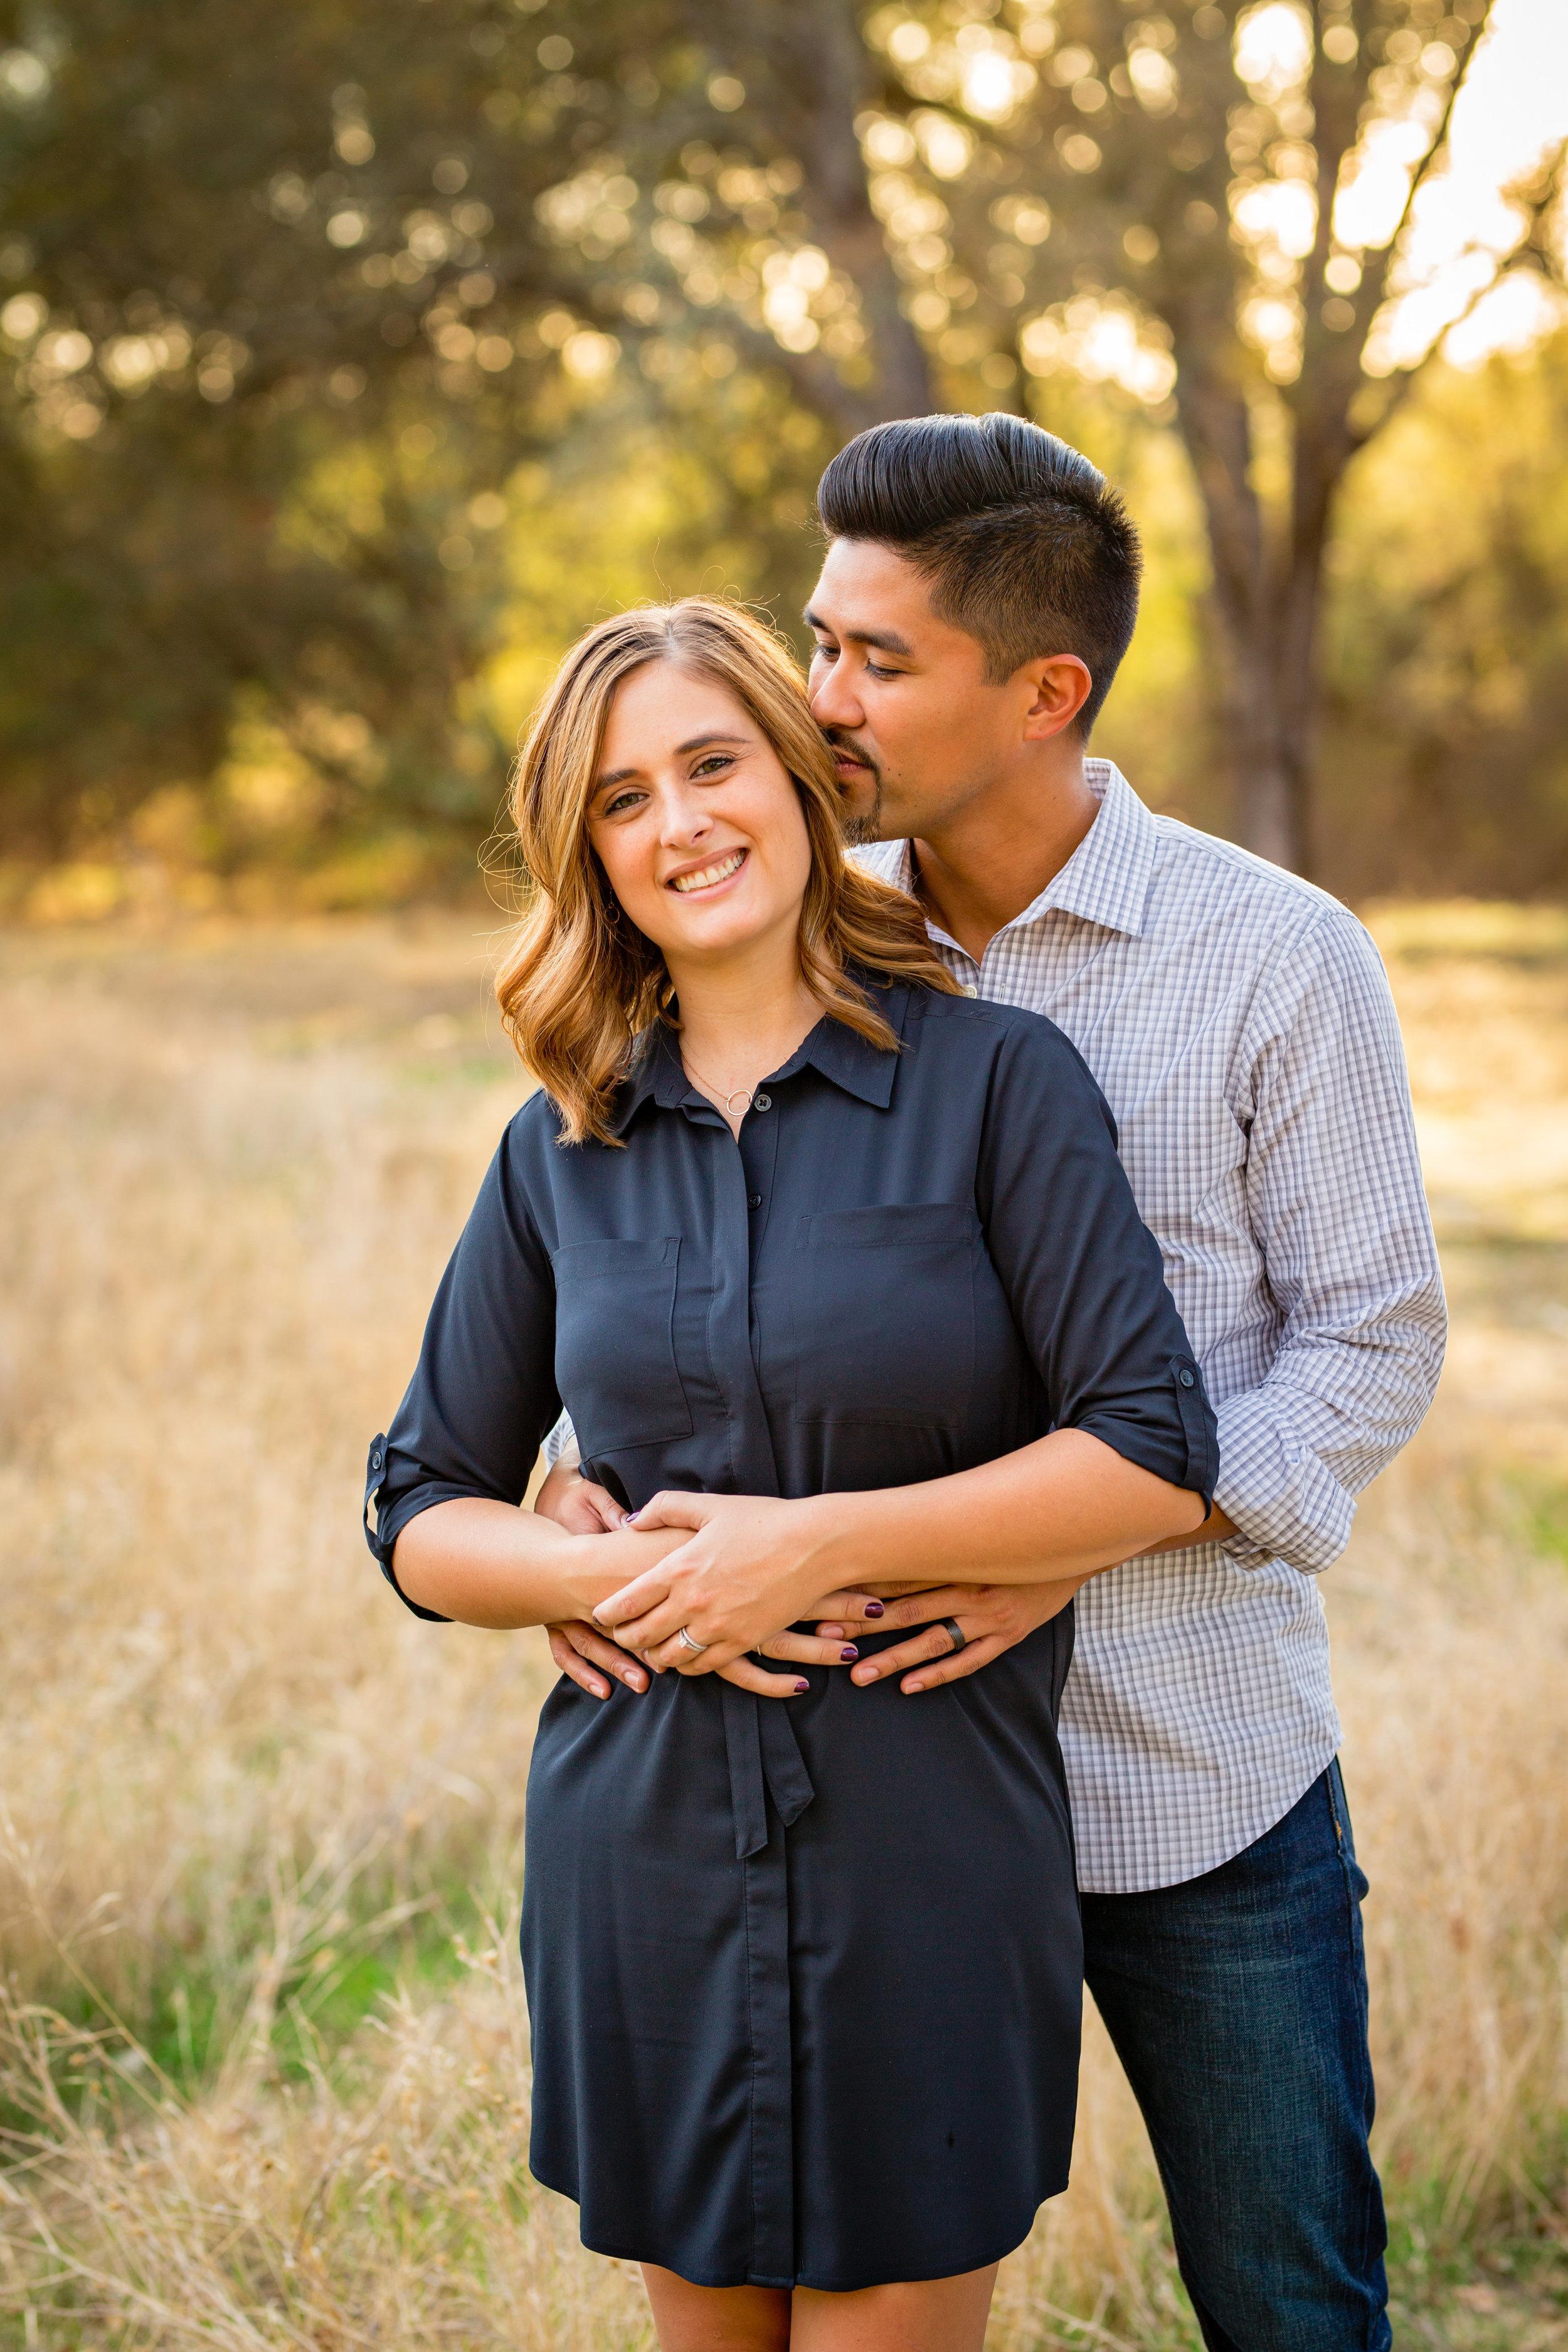 Zoe's Family Photos - Sacramento Wedding Photographer - Ashley Teasley Photography-2.jpg